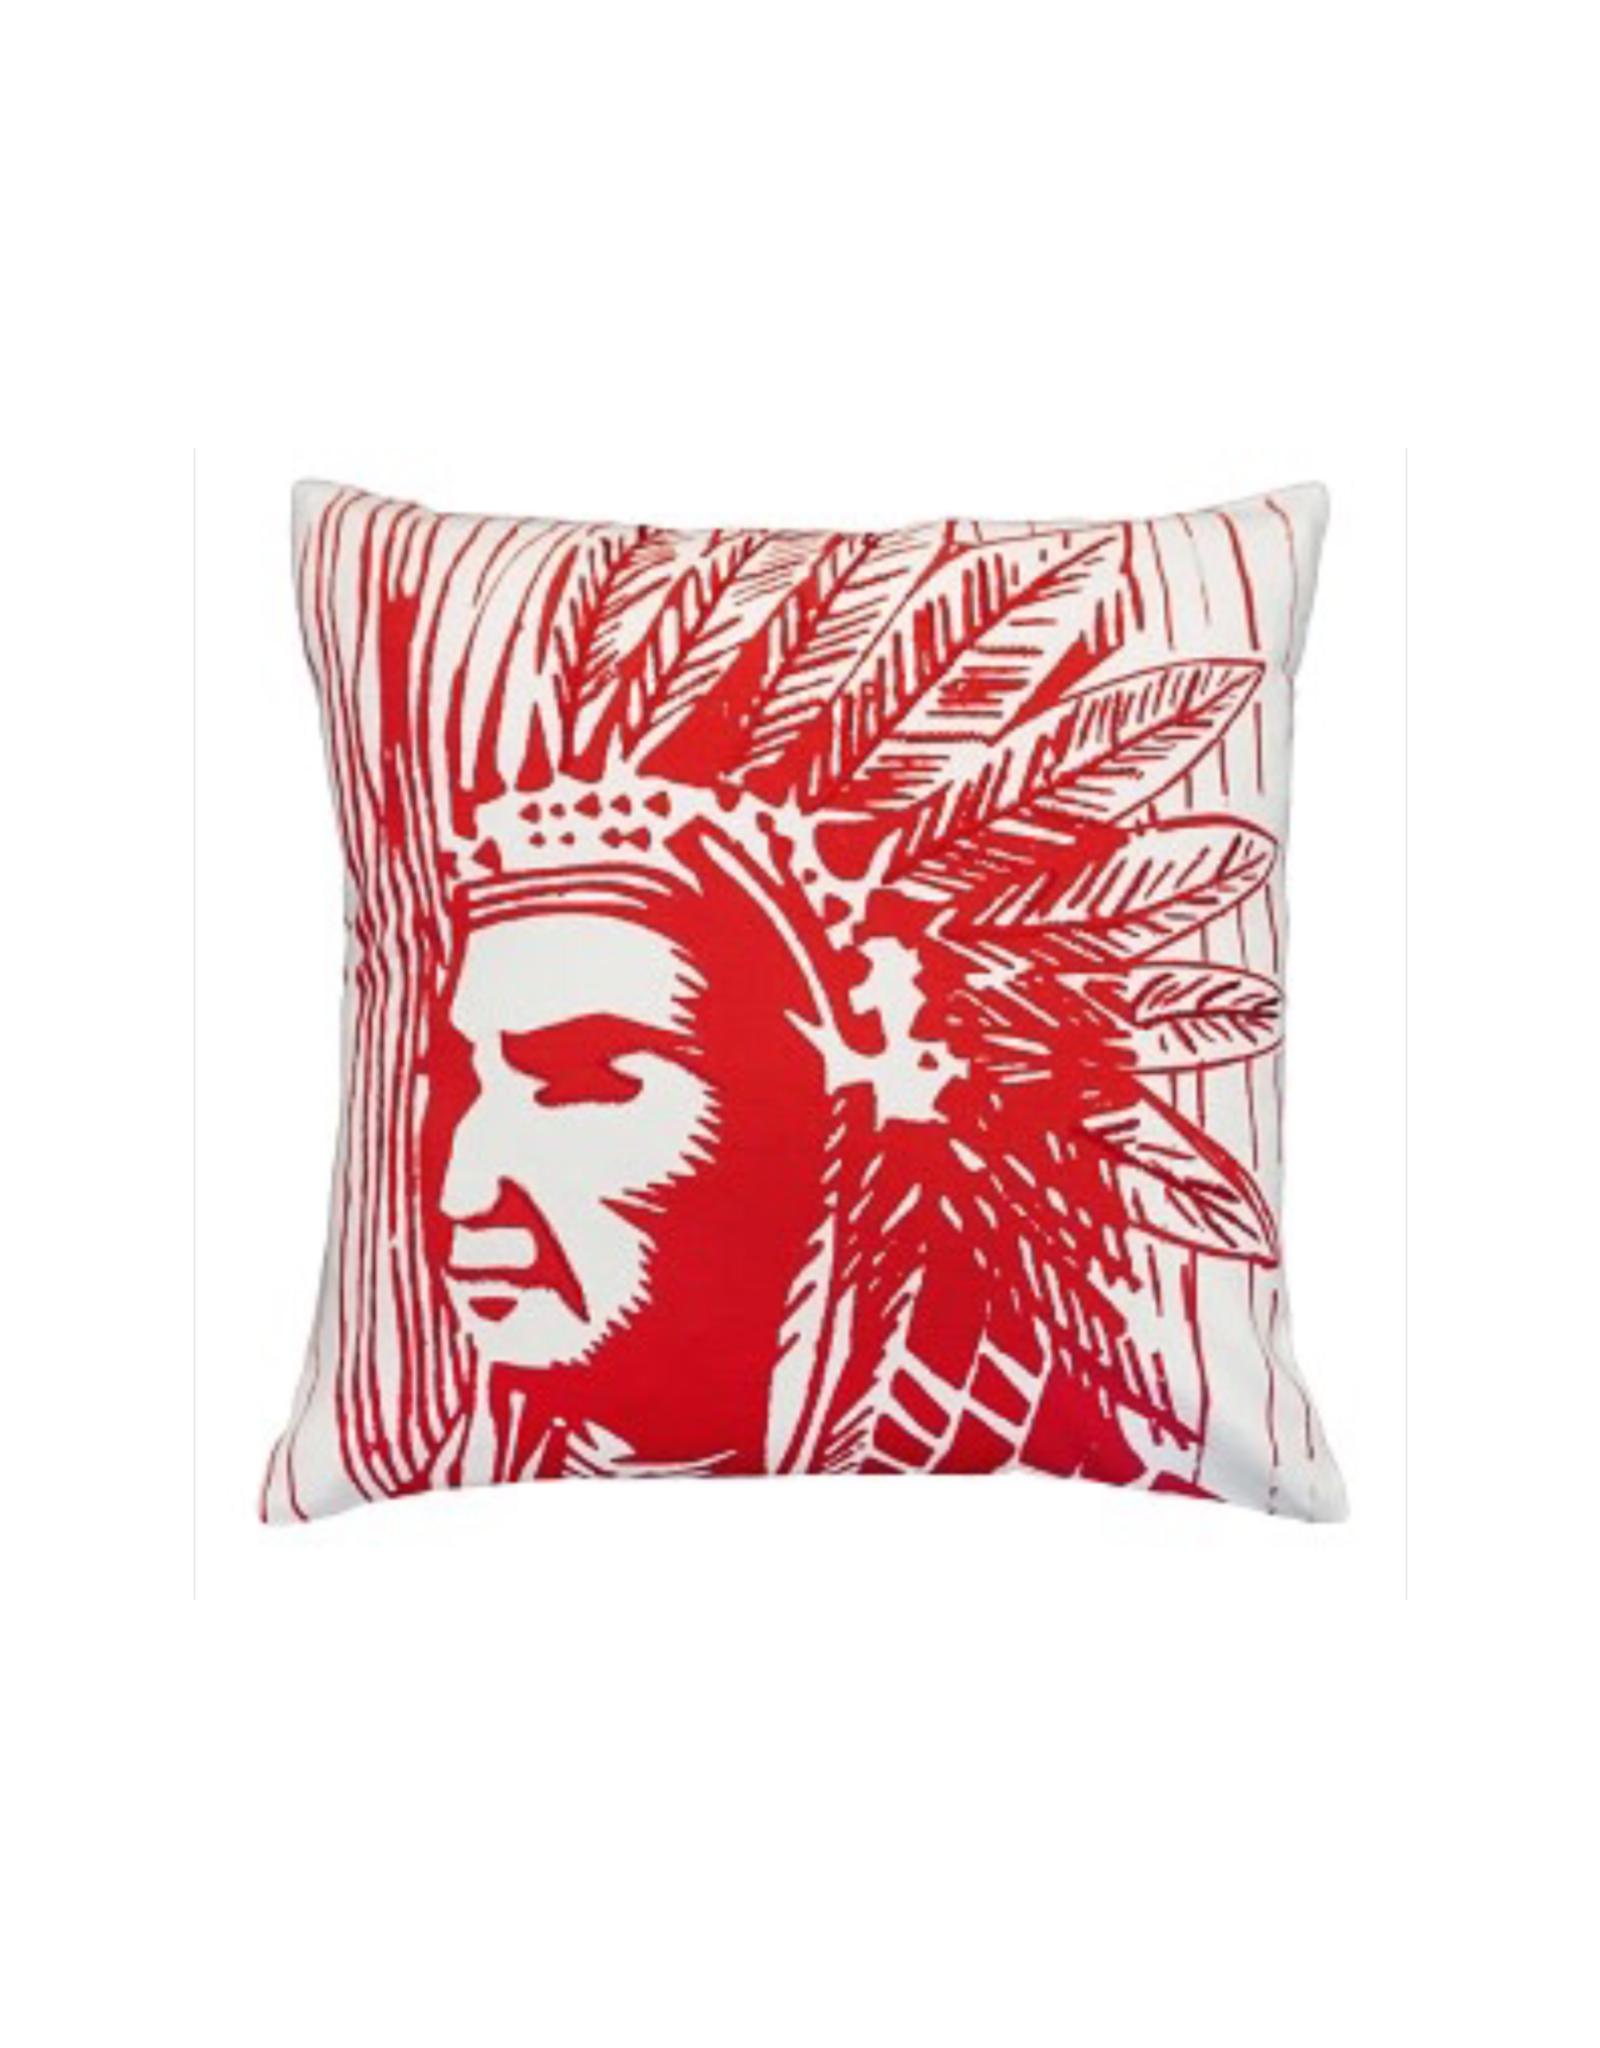 Indian Warrior Pillow